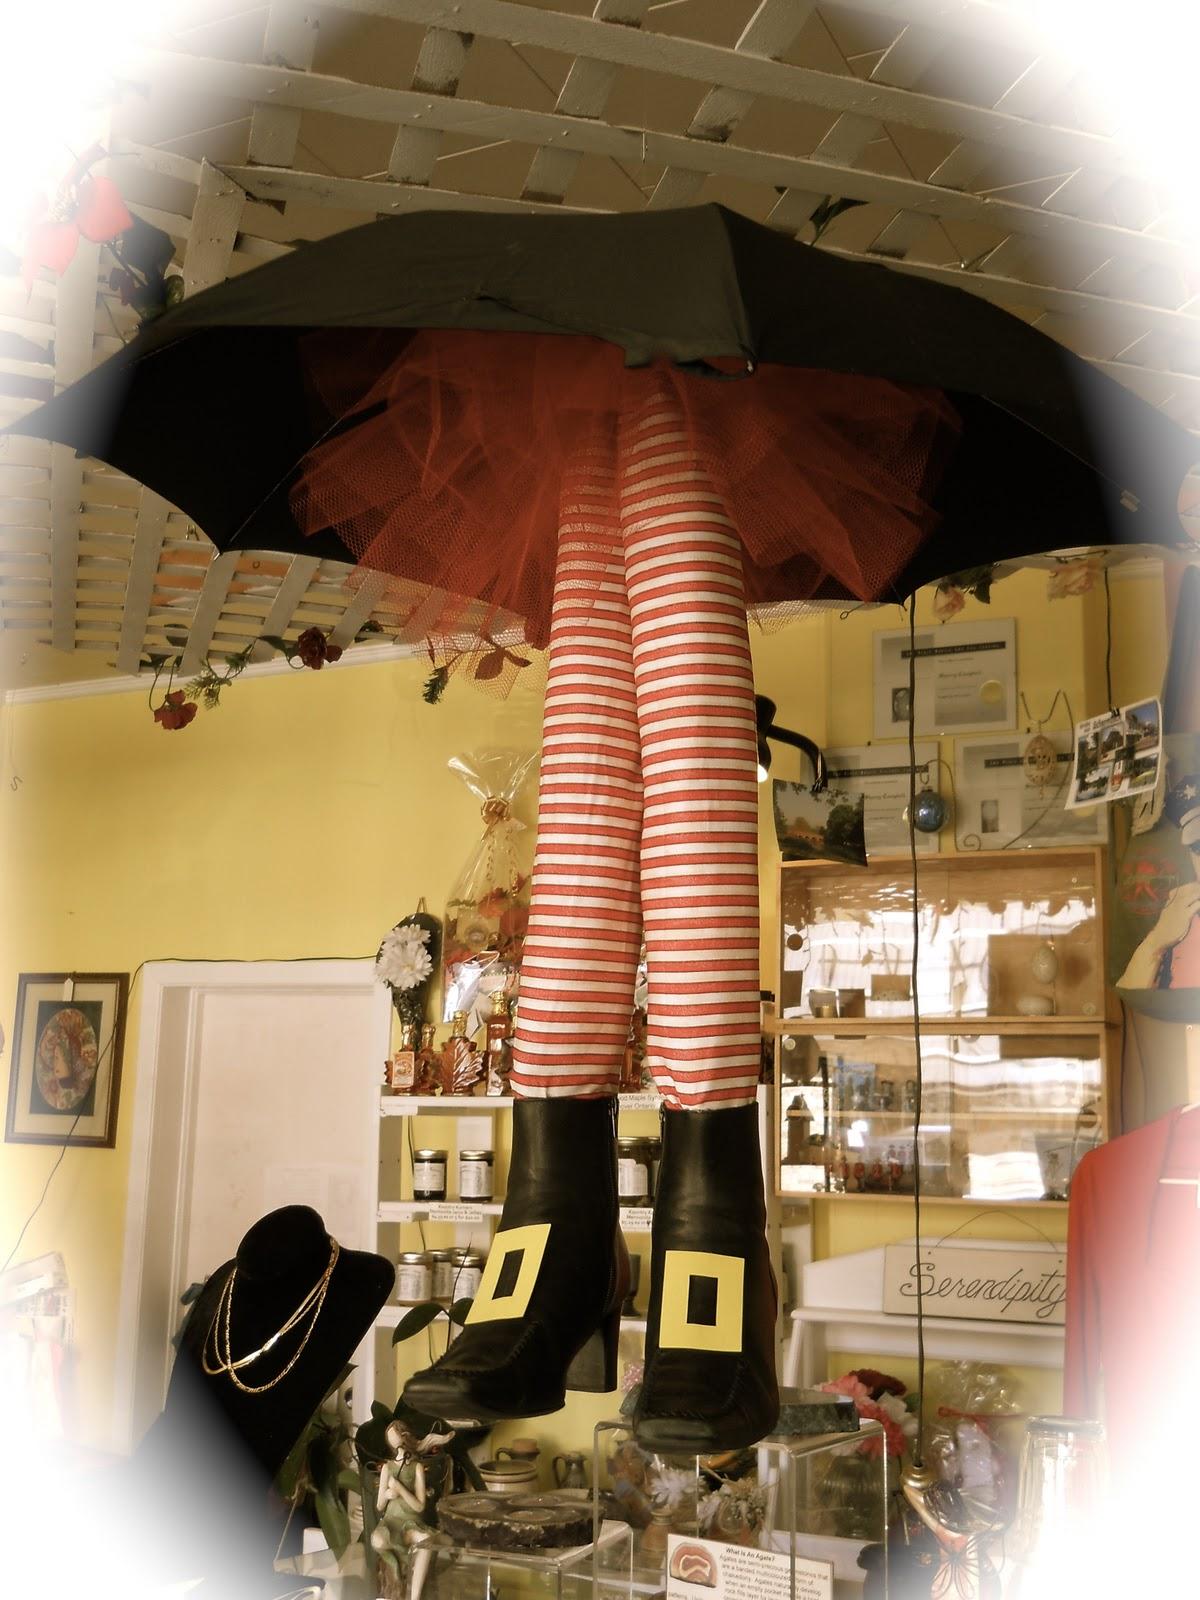 Sherrys on Main Gifts &amp Goodies: Halloween Window Display - Retail Halloween Decorations